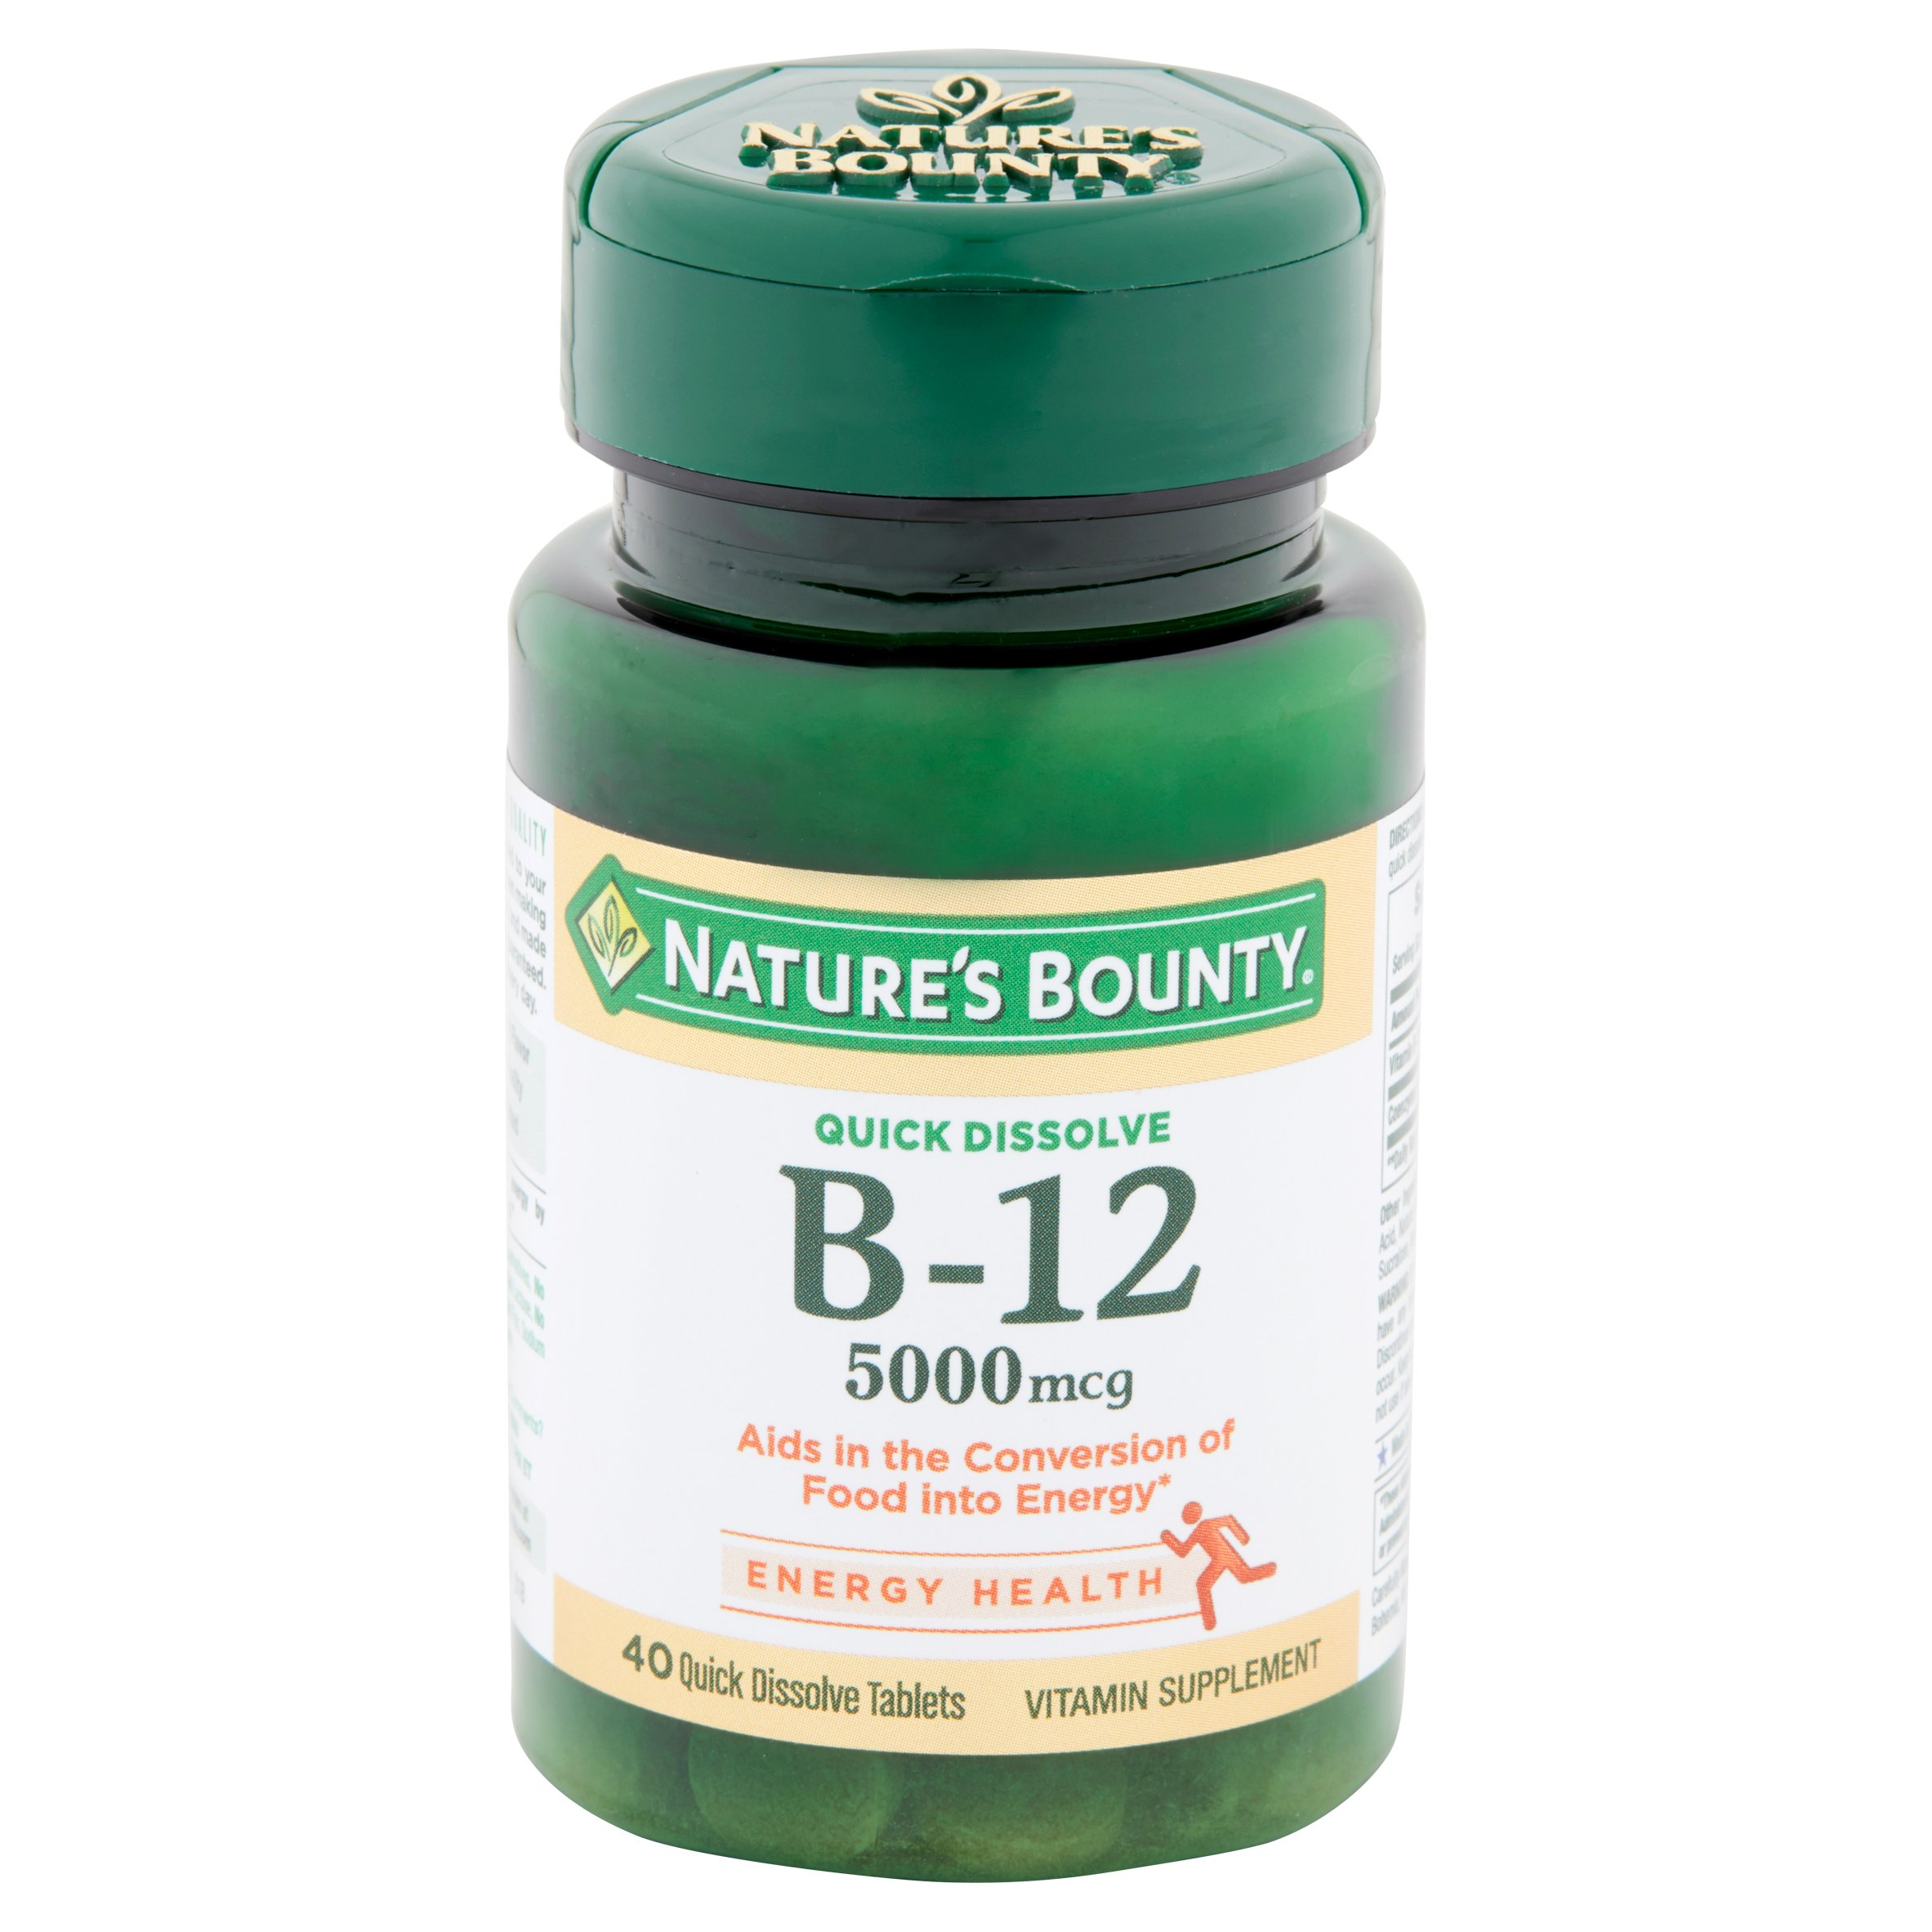 Nature's Bounty Quick Dissolve B-12 Tablets, 5000 mcg, 40 Ct